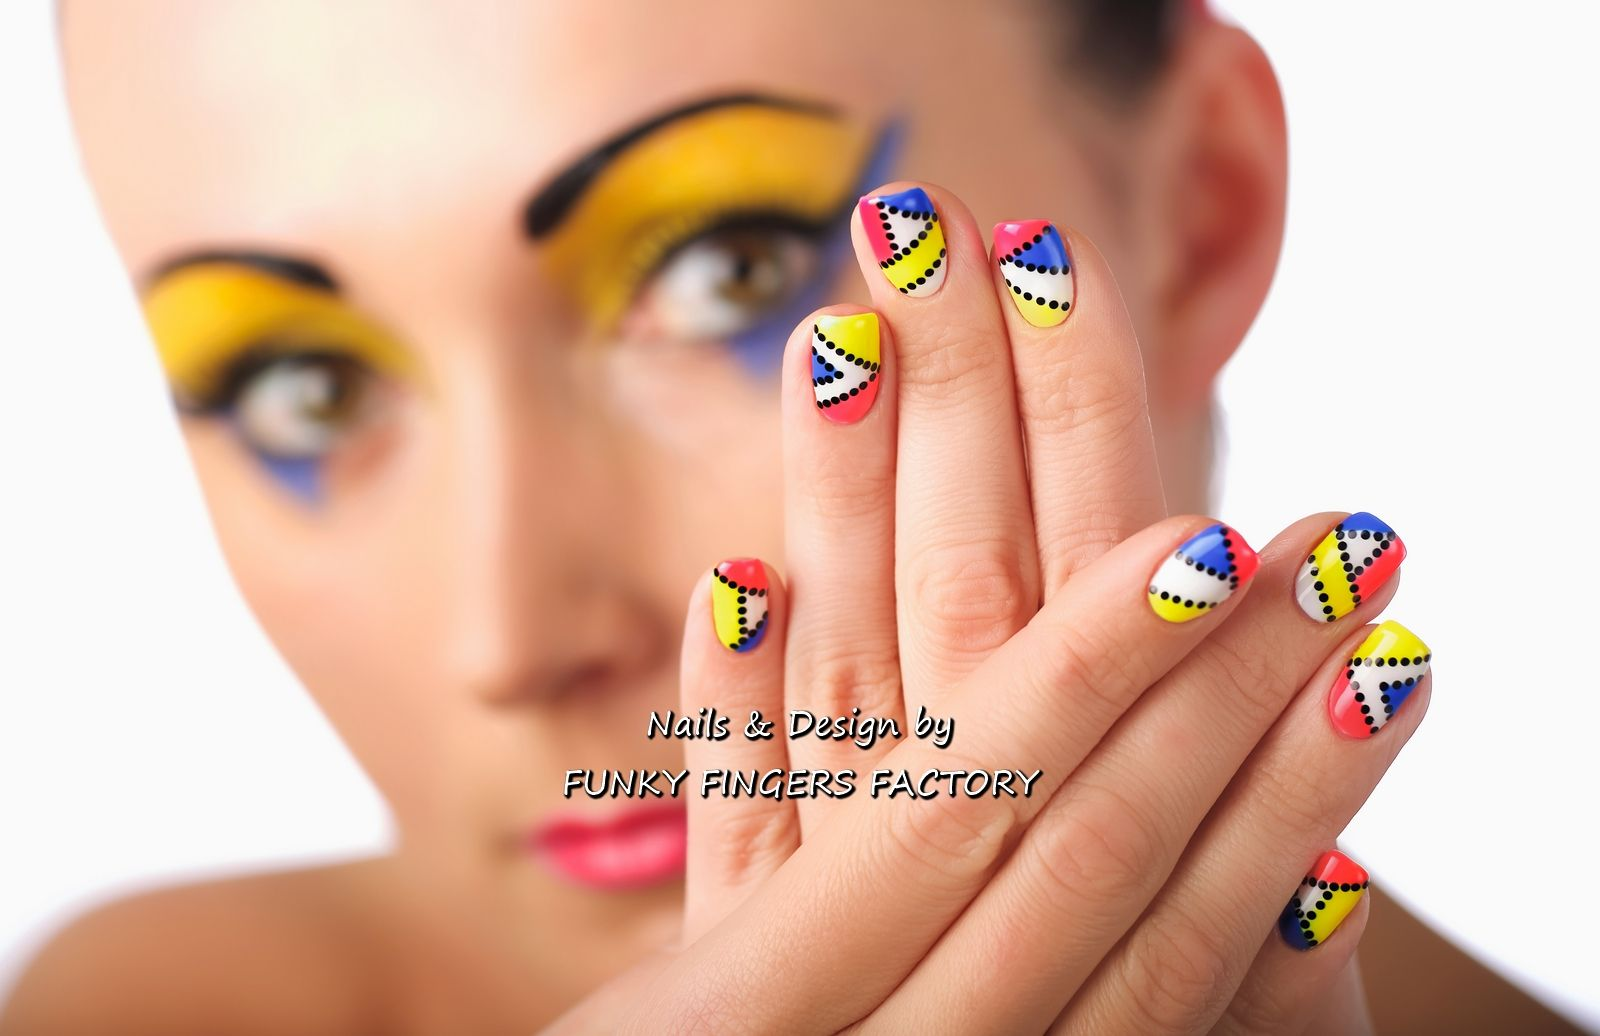 Gelish Pop Art Nail Art By Funky Fingers Factory Nails Pinterest